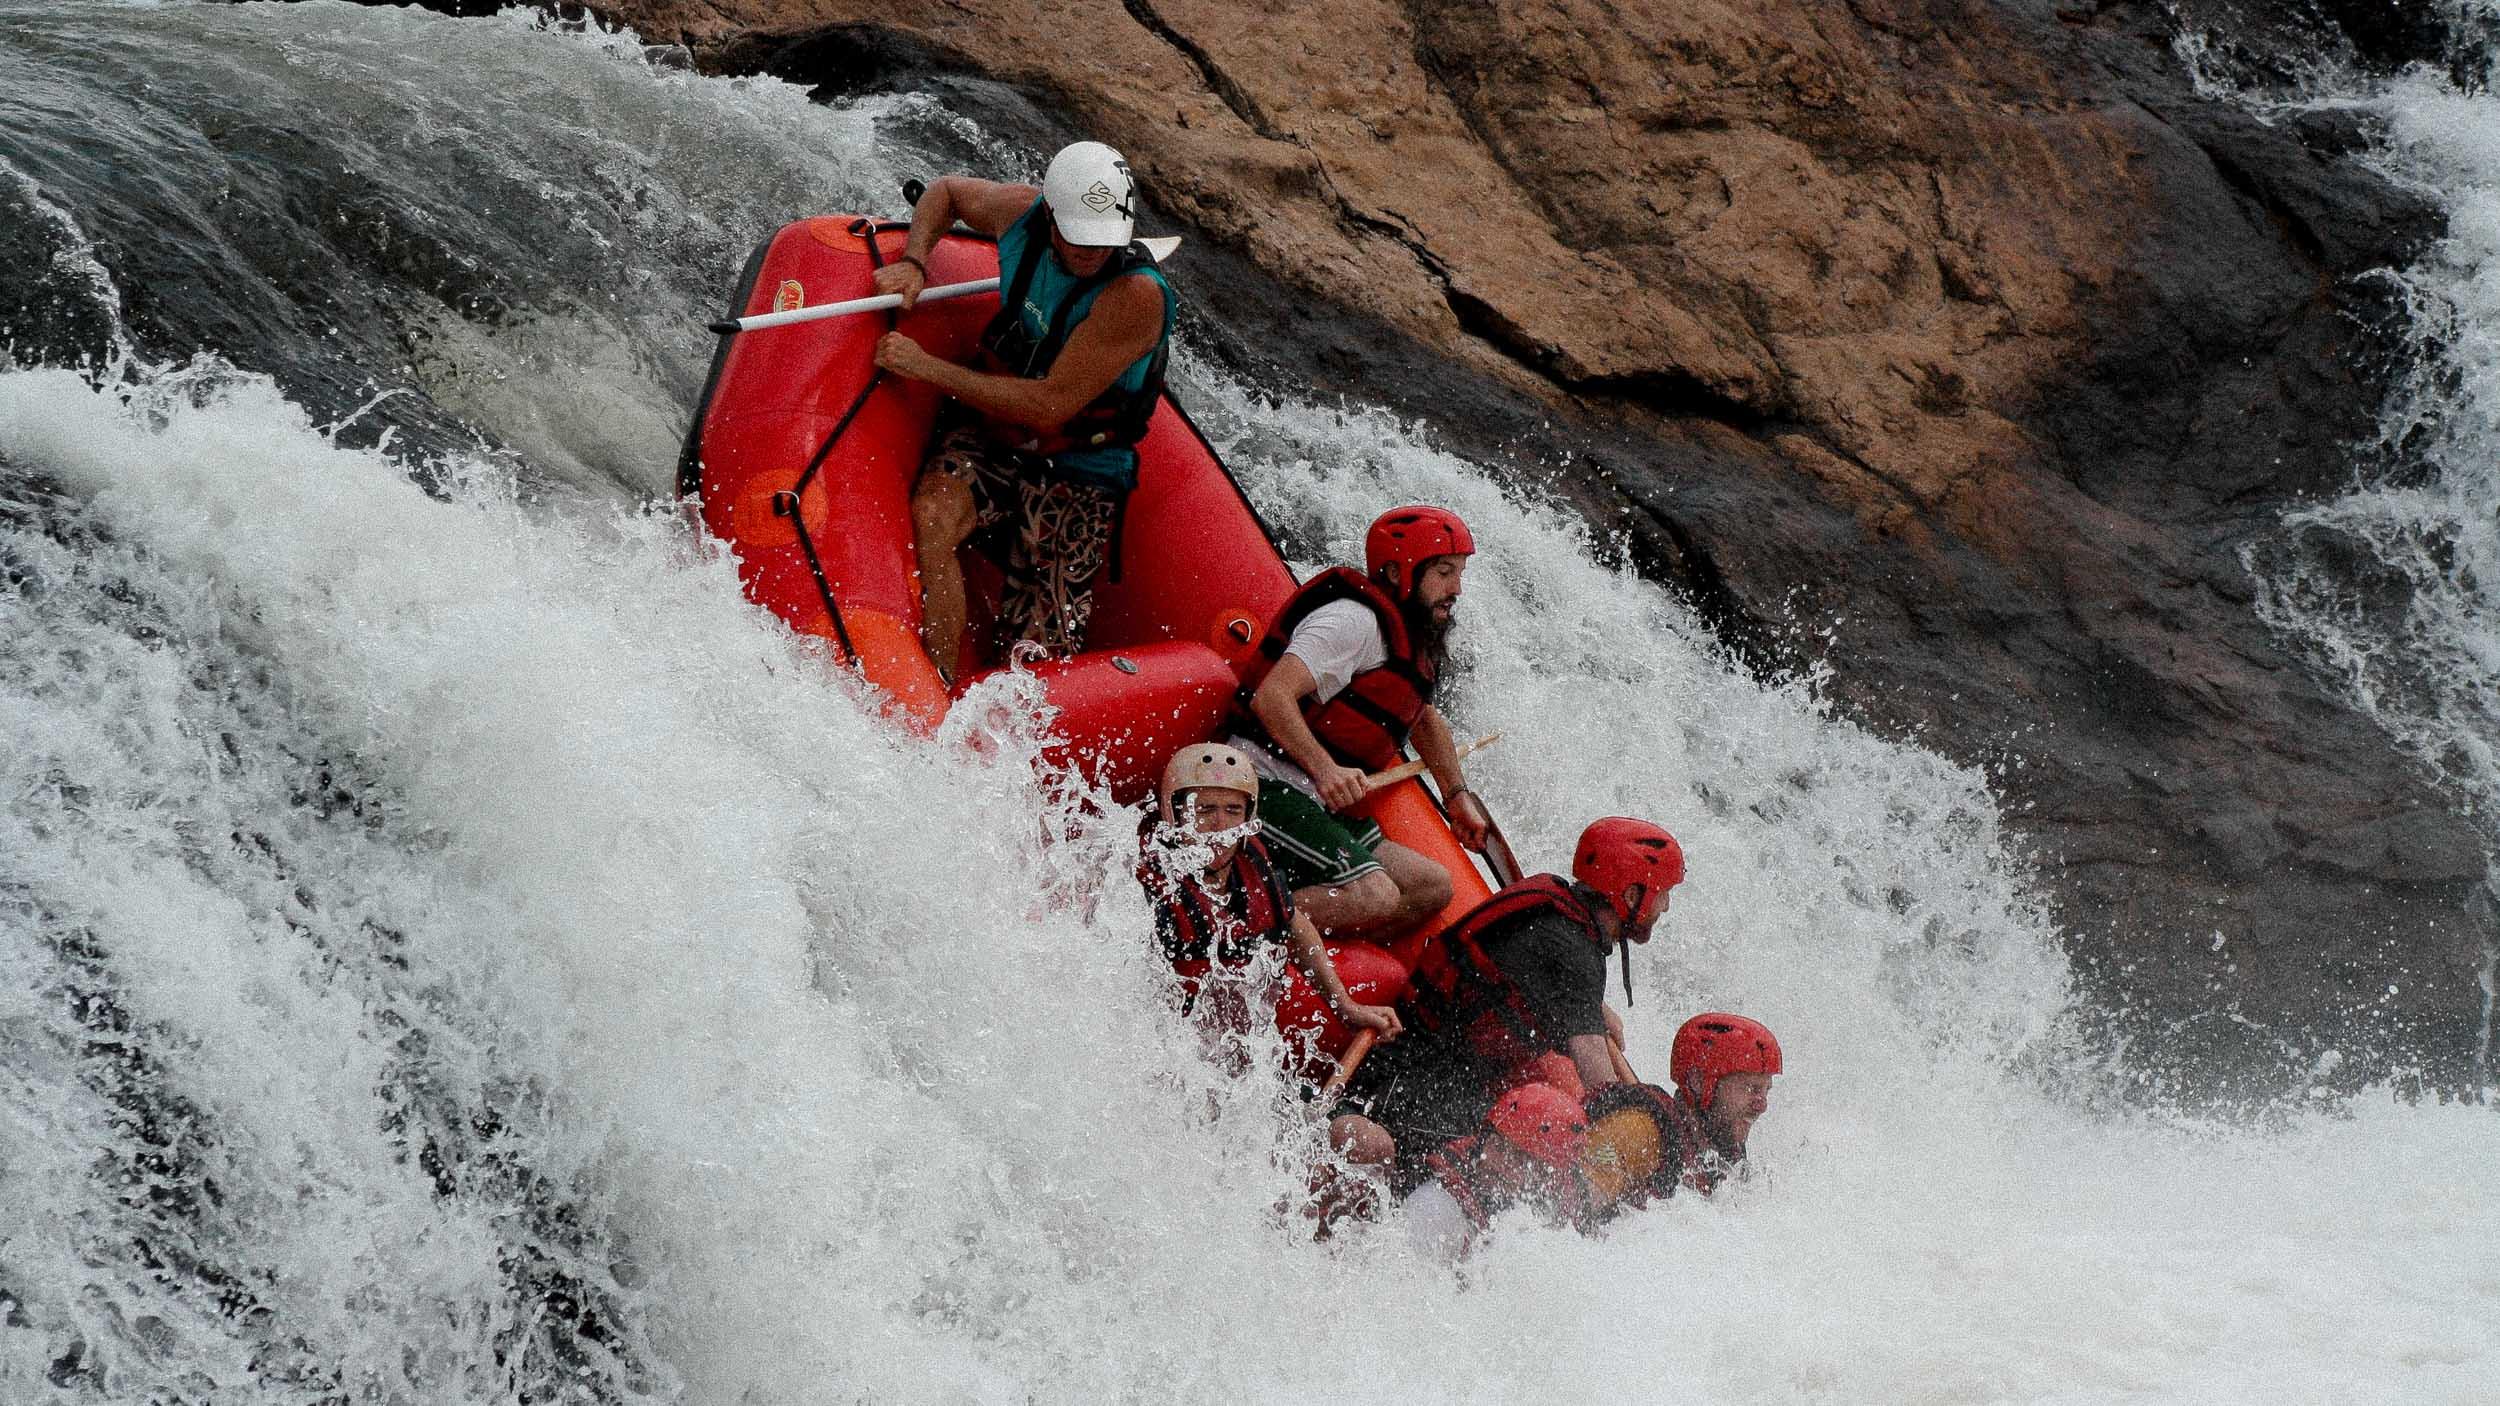 Me-rafting-at-the-source-of-the-Nile-in-Uganda.jpg